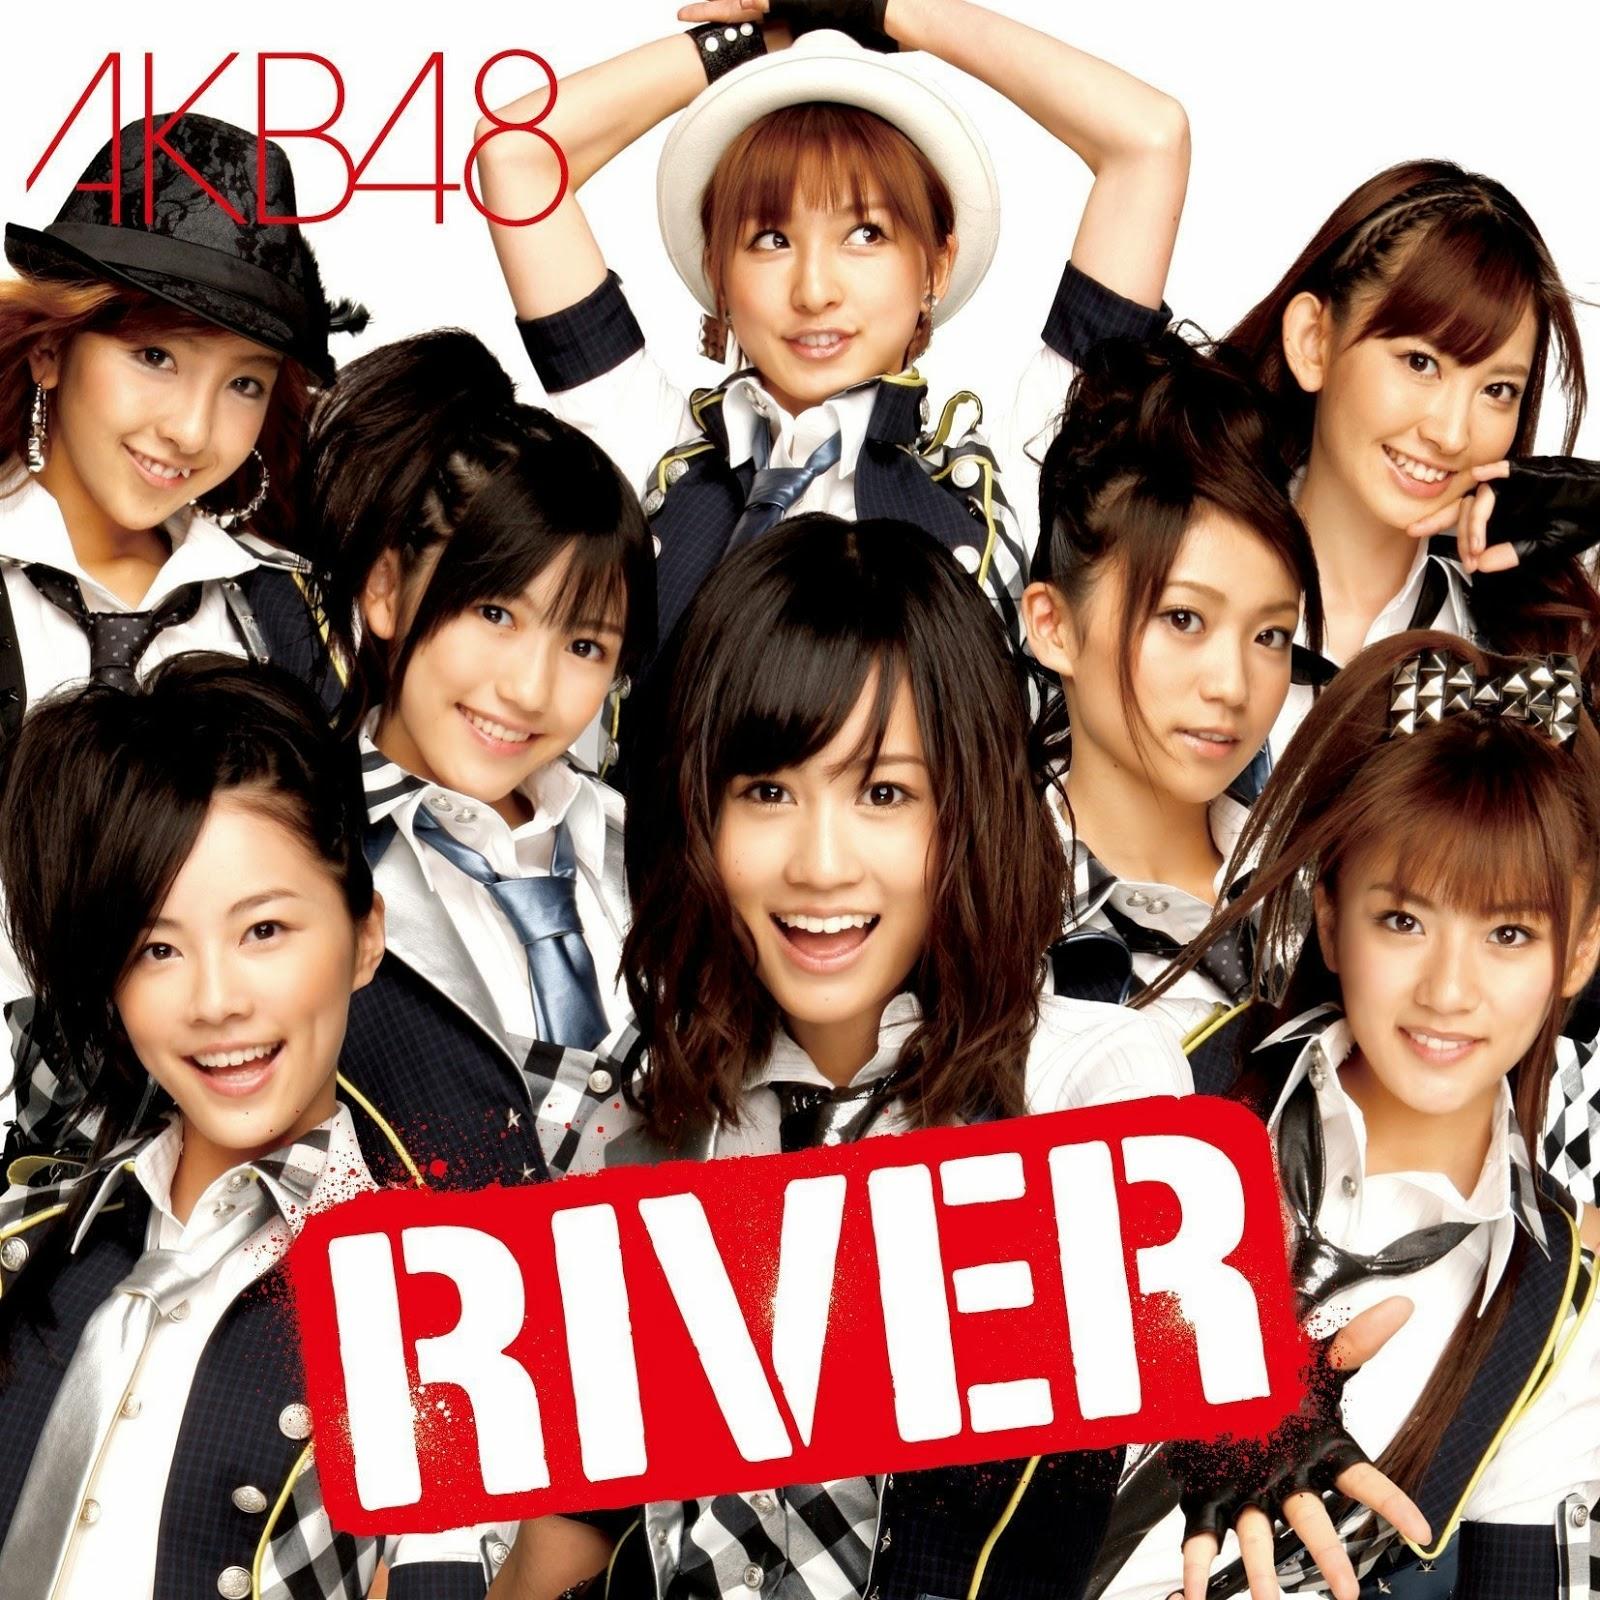 River_reg.jpg (1600×1600)